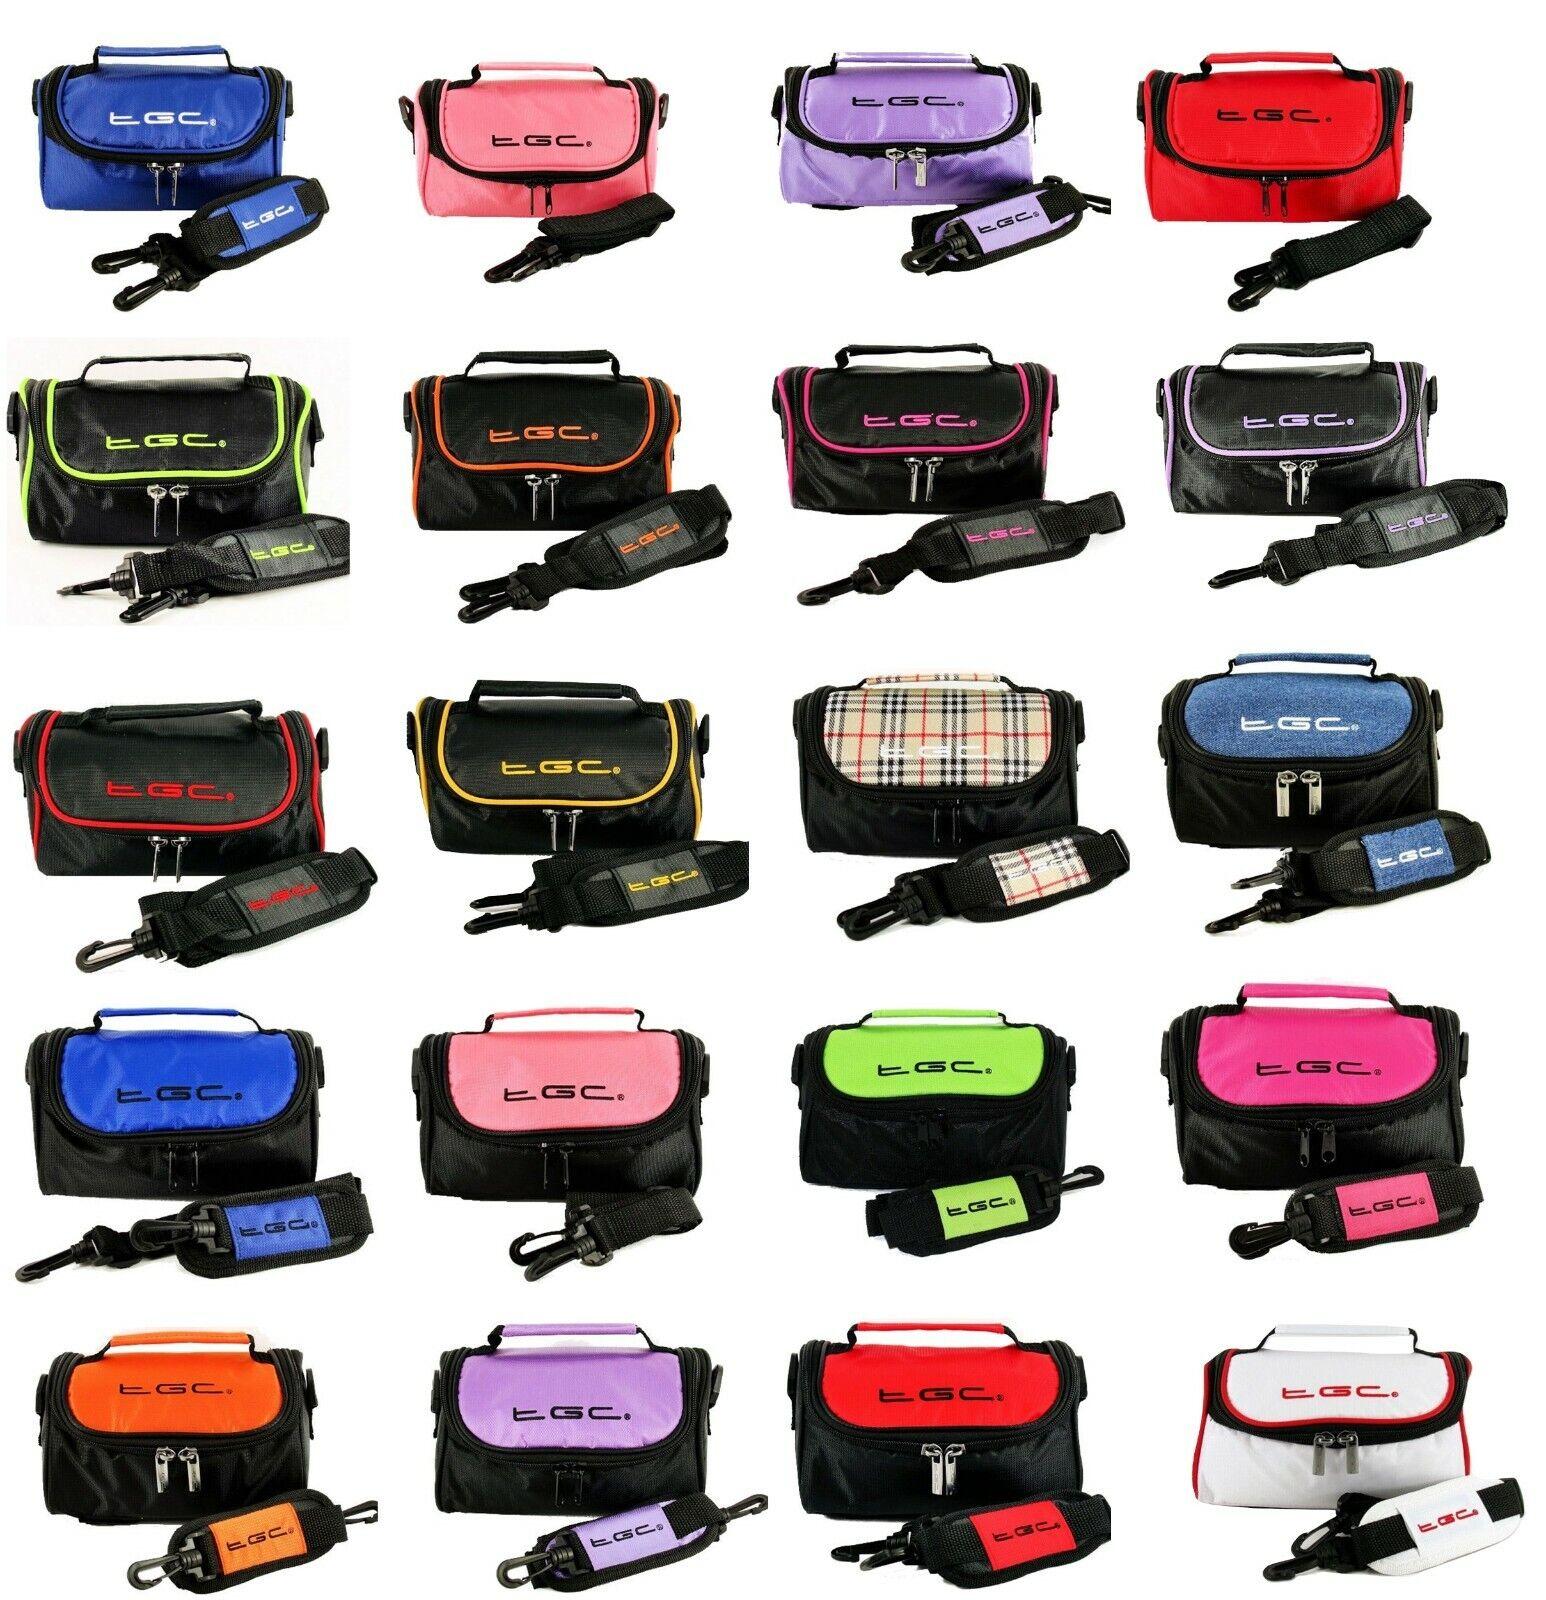 New Camera Shoulder Case Bag by TGC ® For Fujifilm FinePix XP130